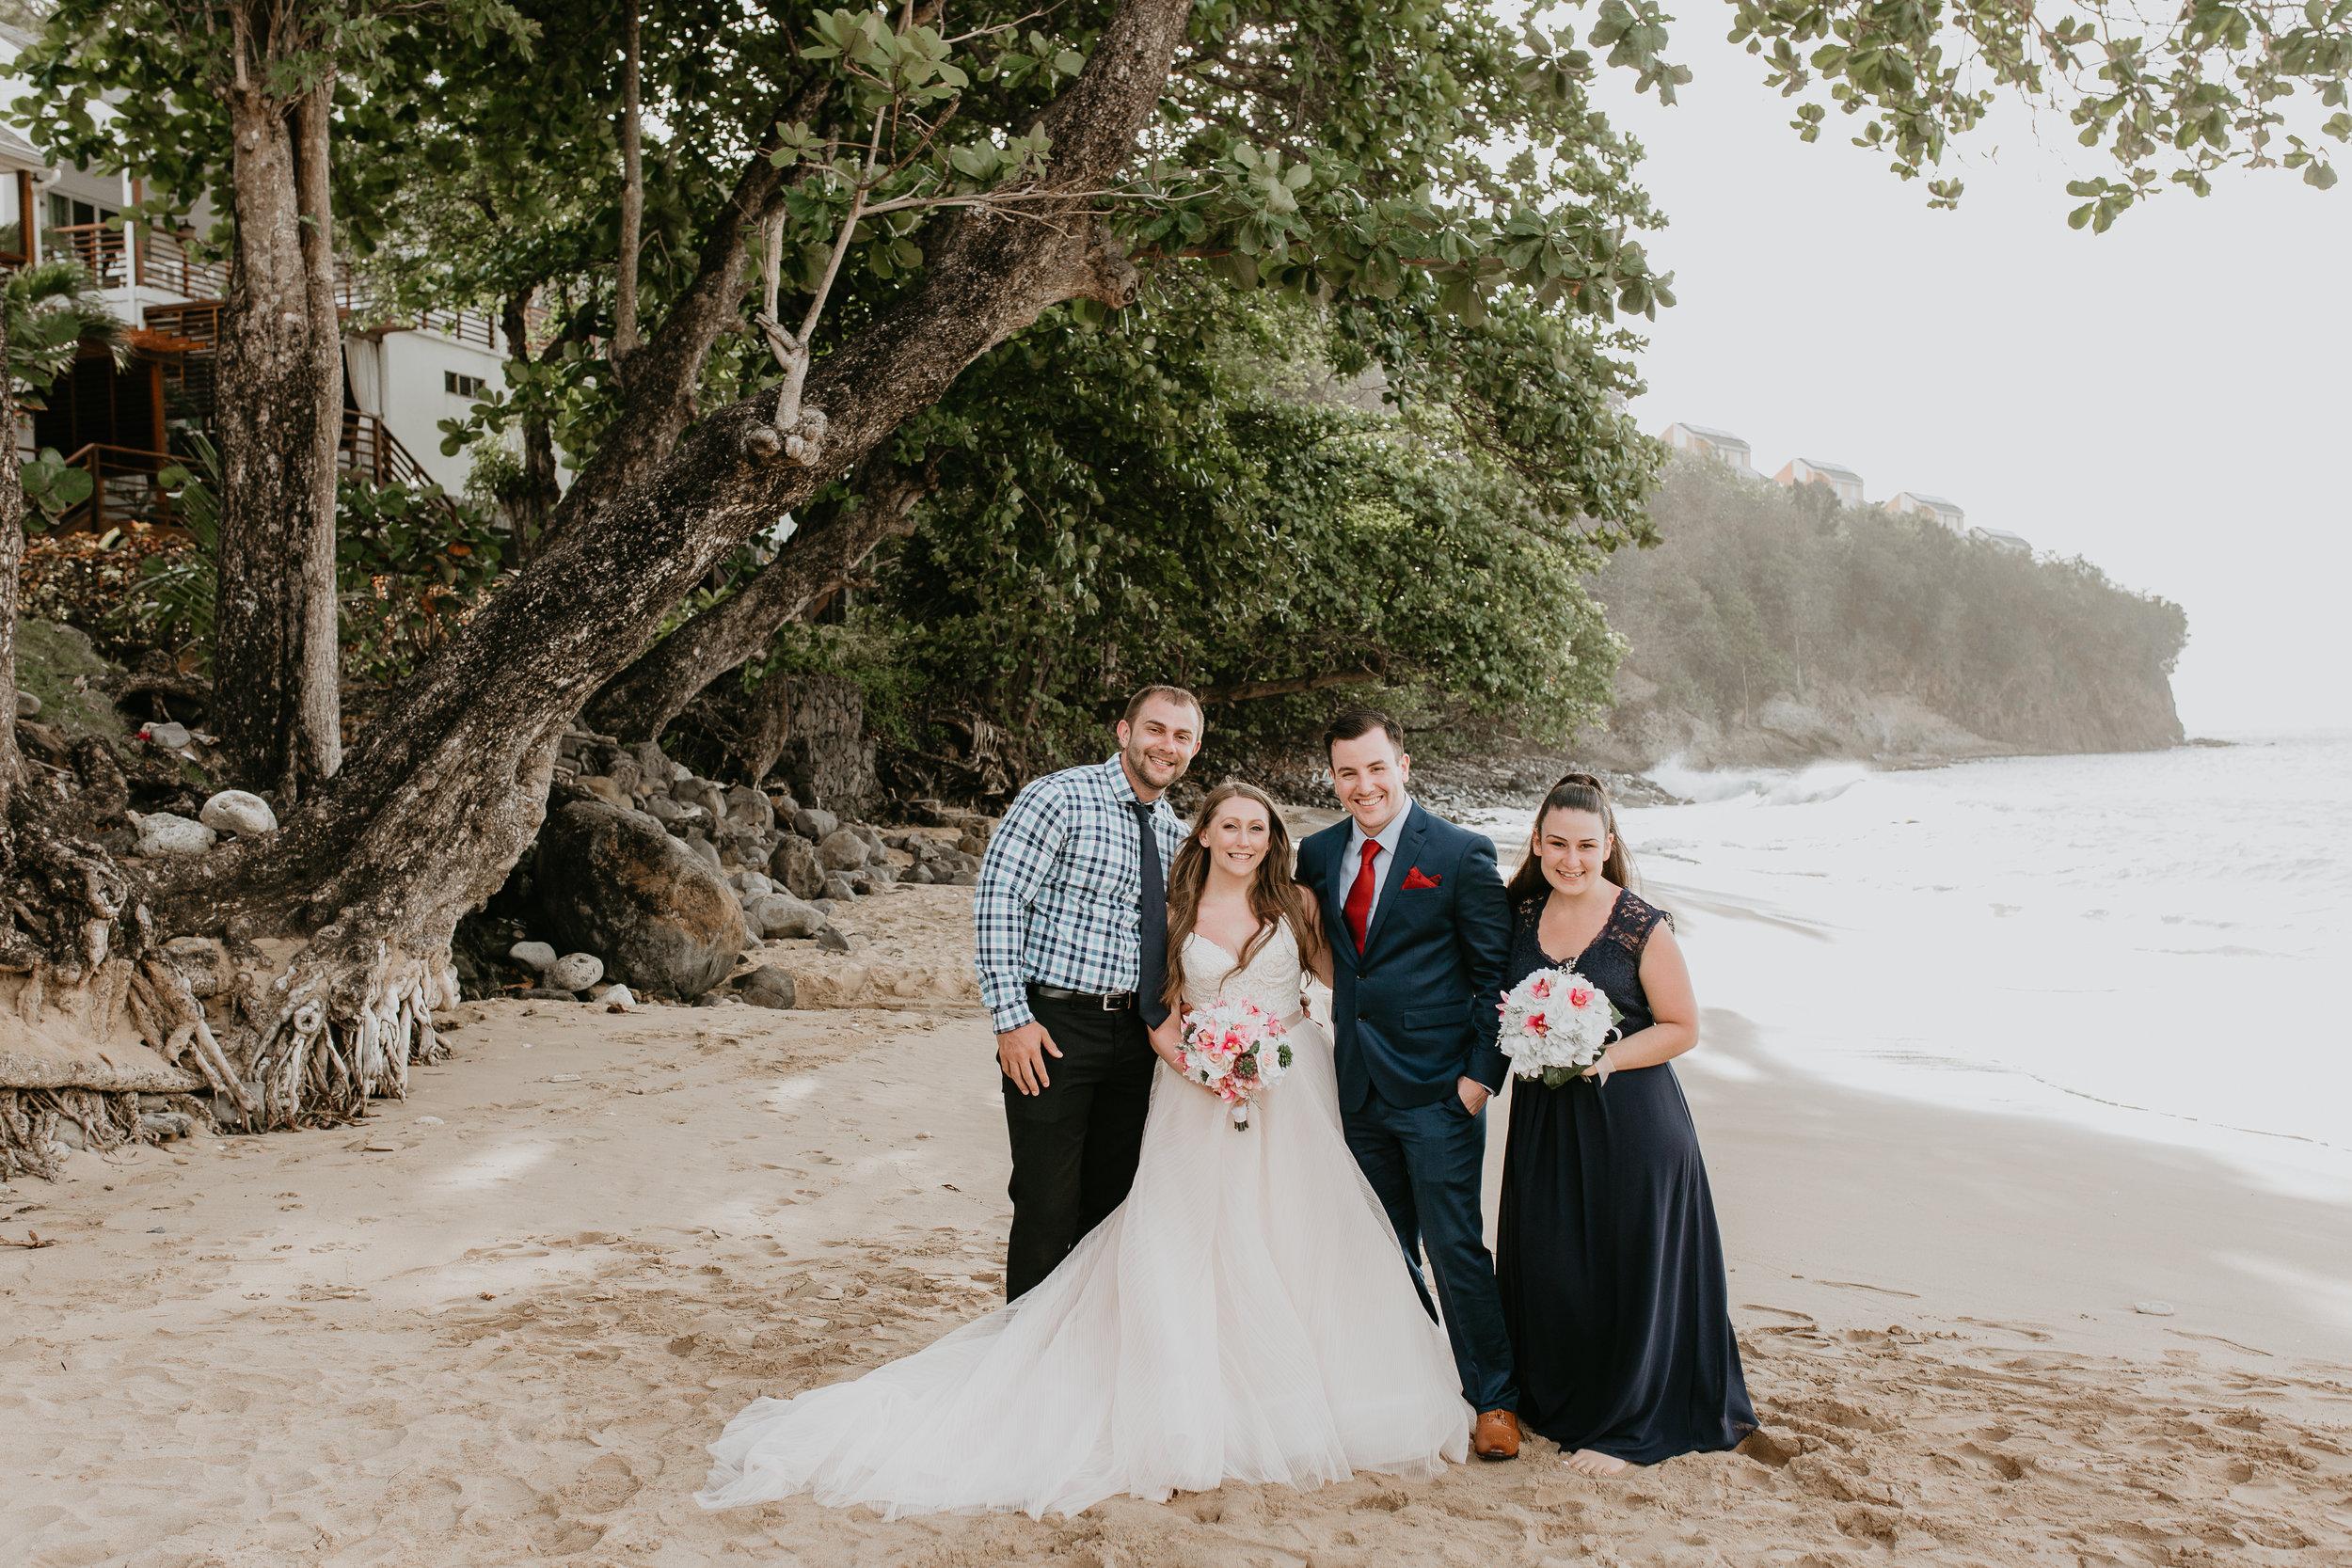 nicole-daacke-photography-destination-wedding-in-st-lucia-sandals-la-toc-intimate-island-wedding-carribean-elopement-photographer-chill-island-wedding-80.jpg